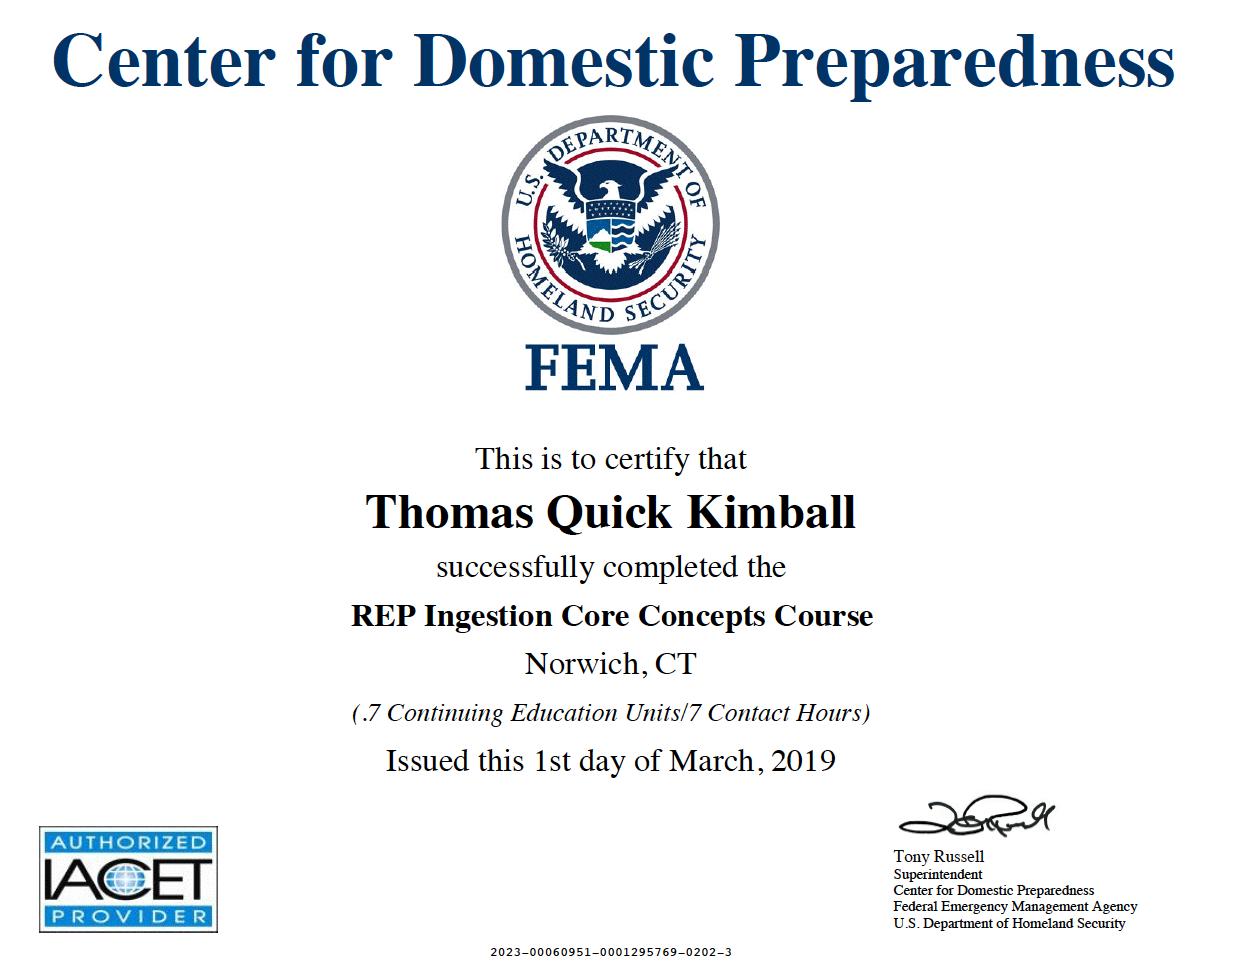 AWR-351 REP Ingestion Core Concepts Course (RICC)